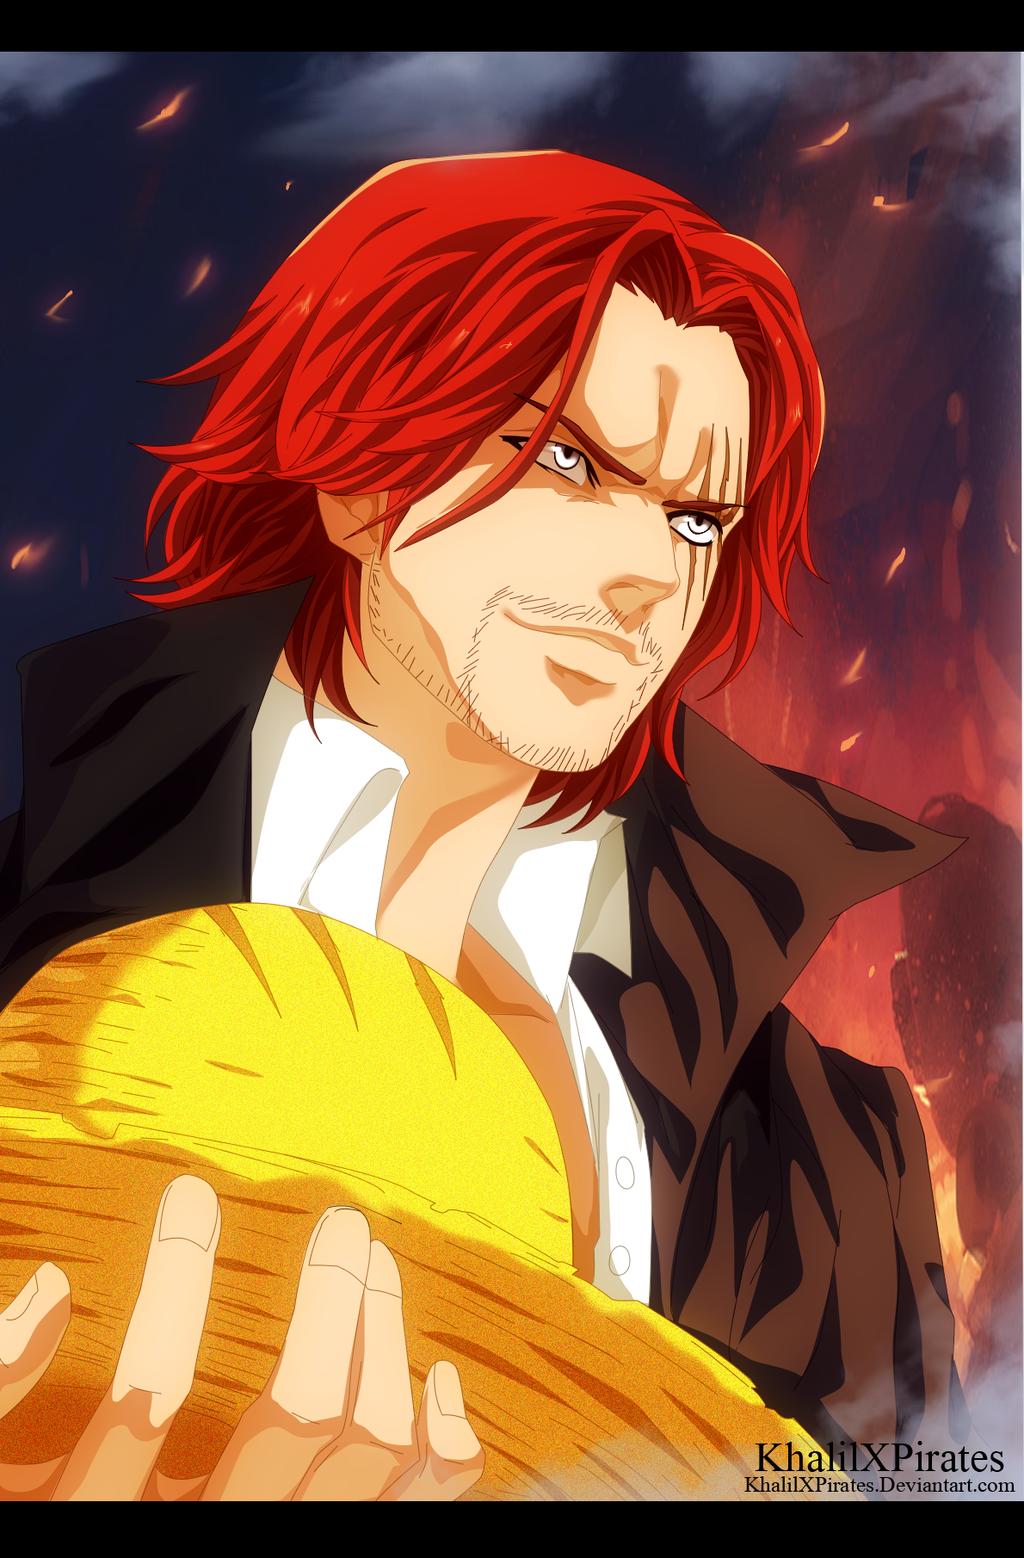 Pin by ΣΠD ツ on One Piece One piece ace, One piece